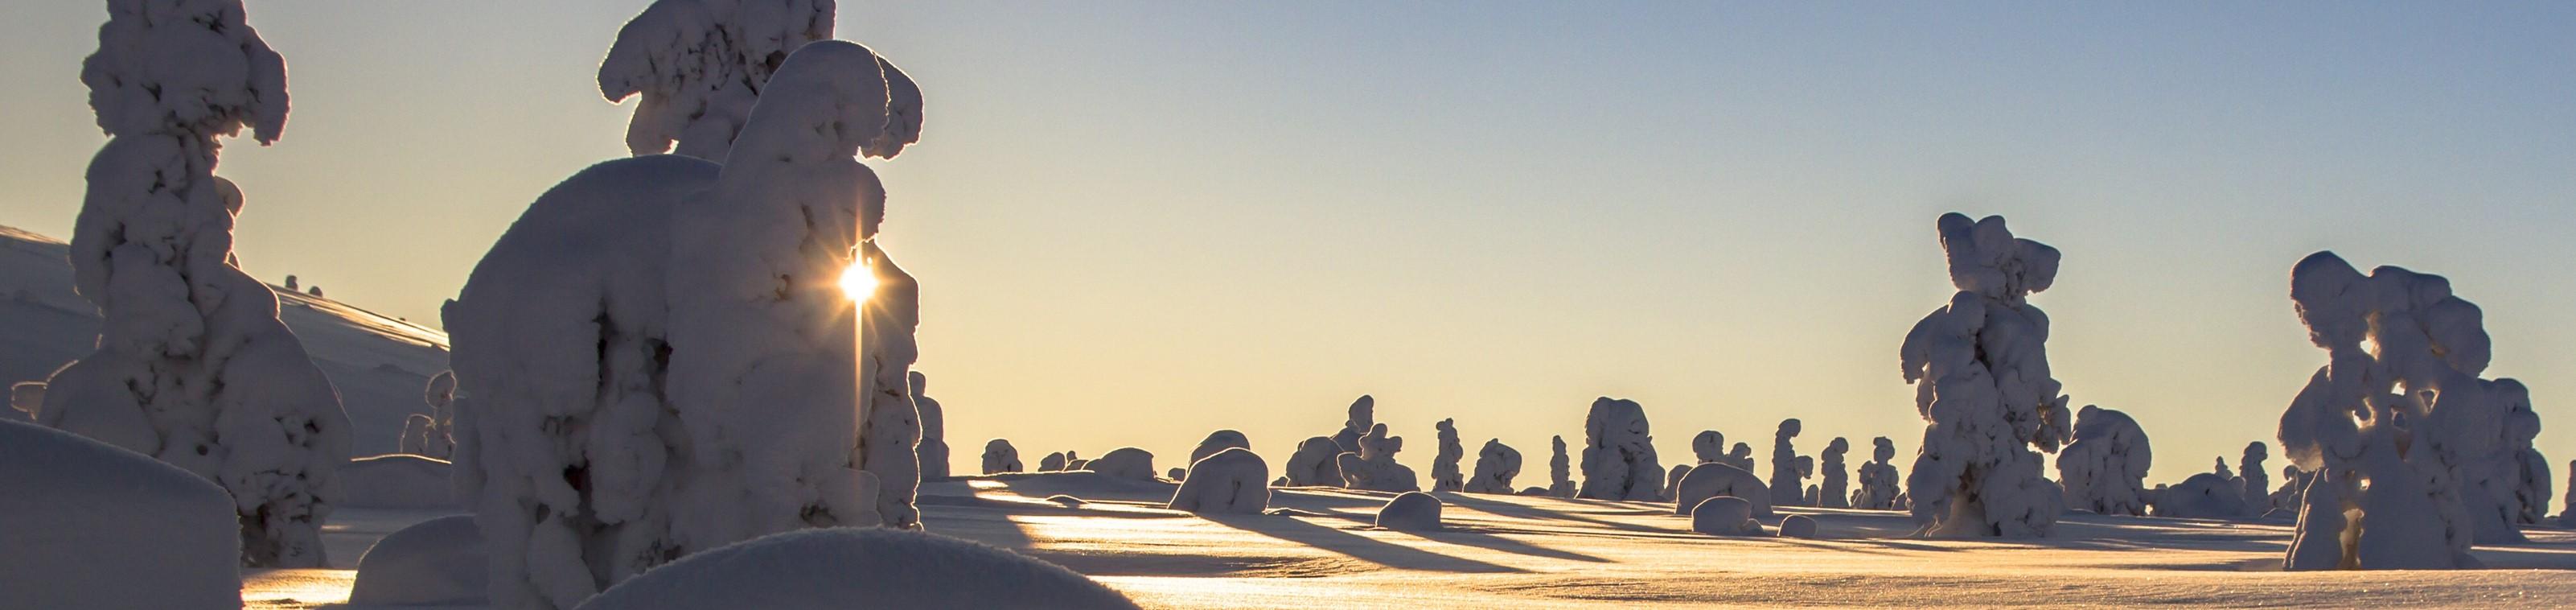 Winters avontuur in Fins Lapland